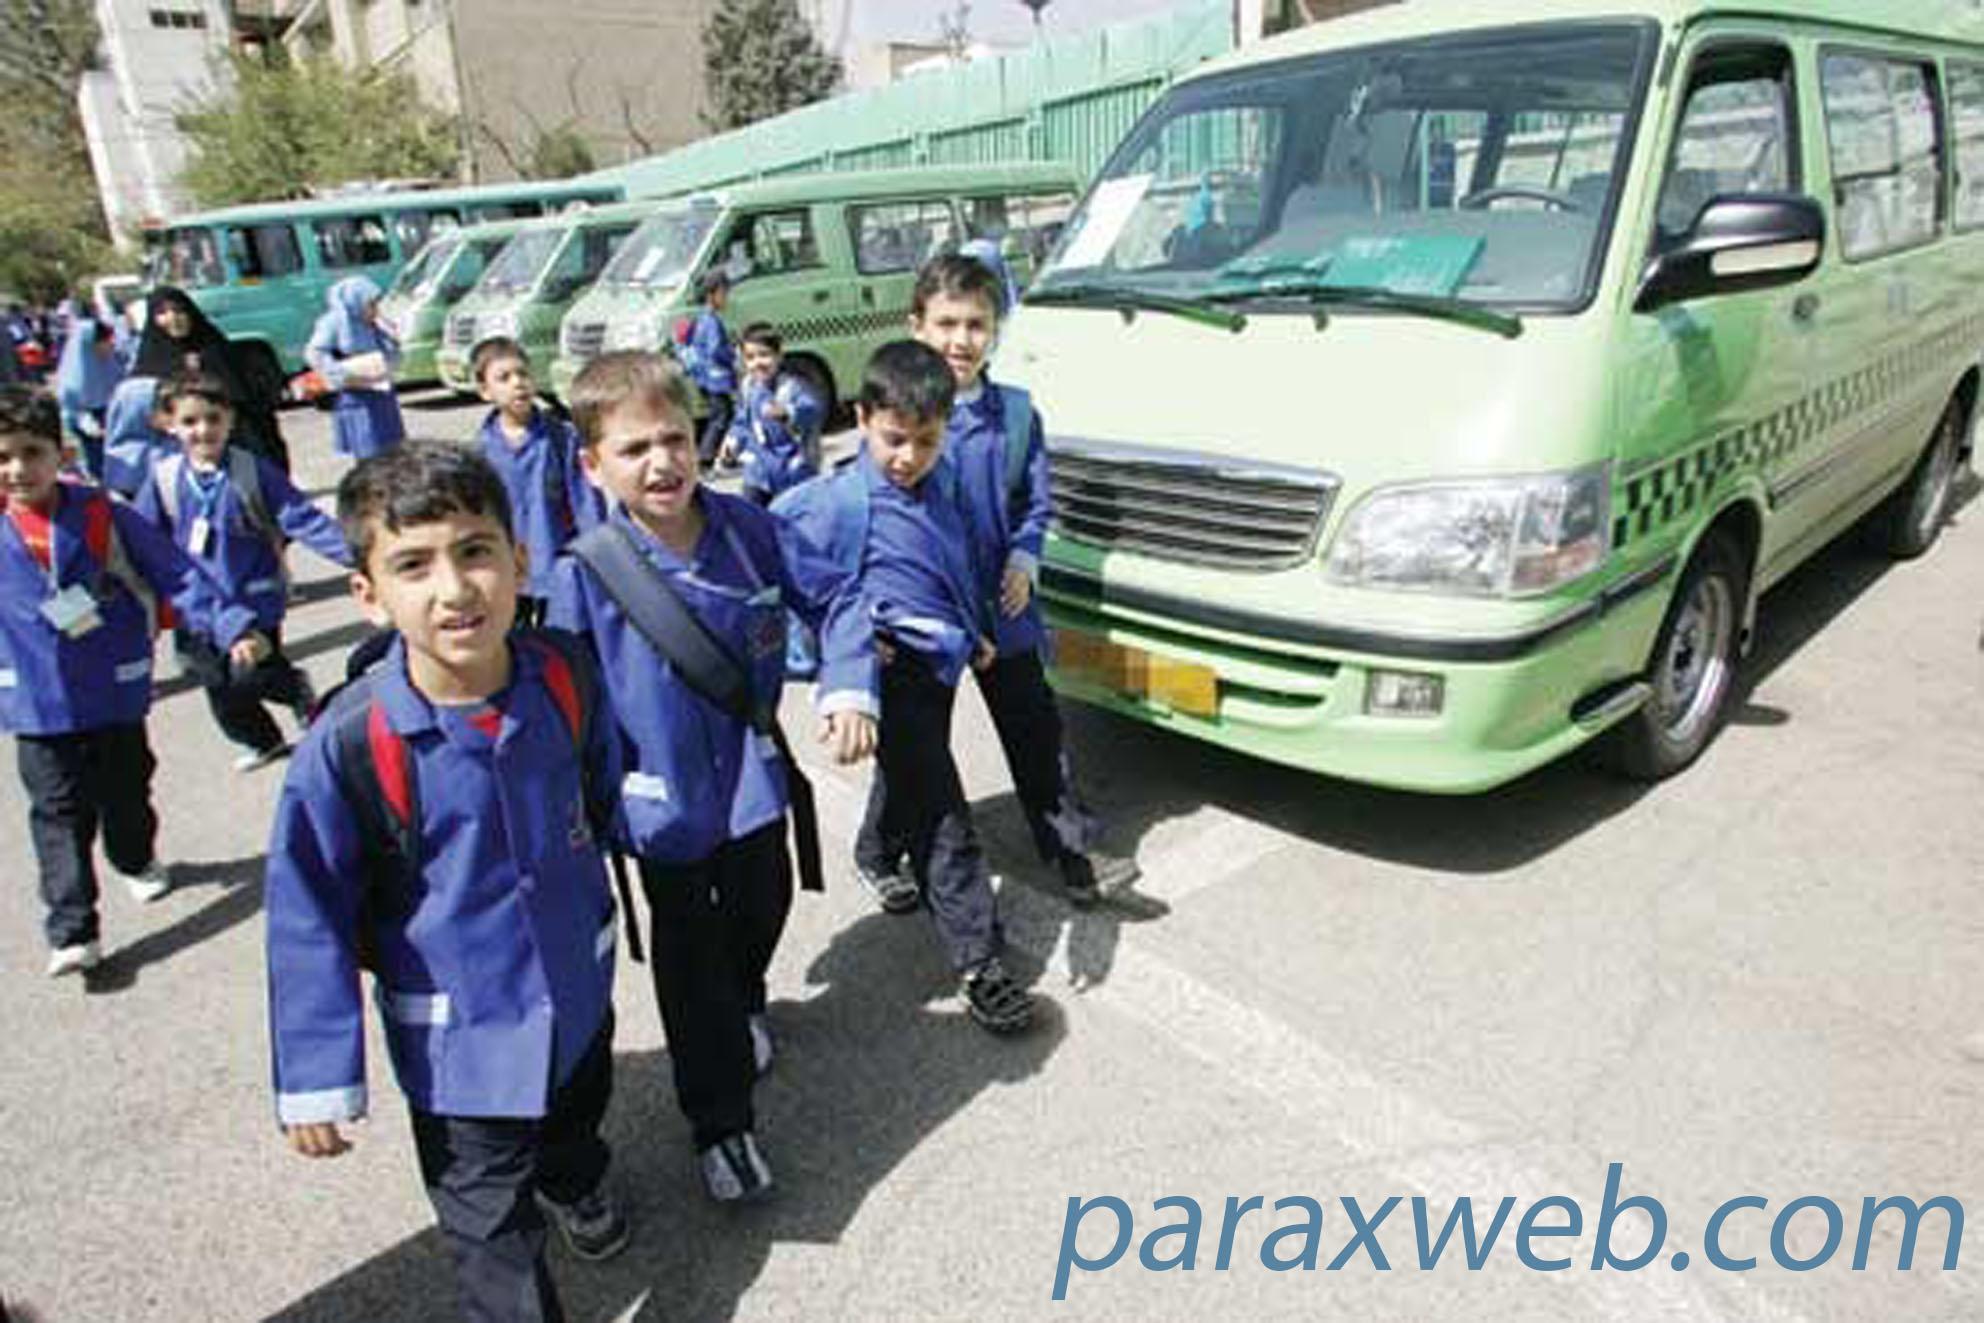 موقعيت يابي آني سرويس مدارس با نرم افزار سمر